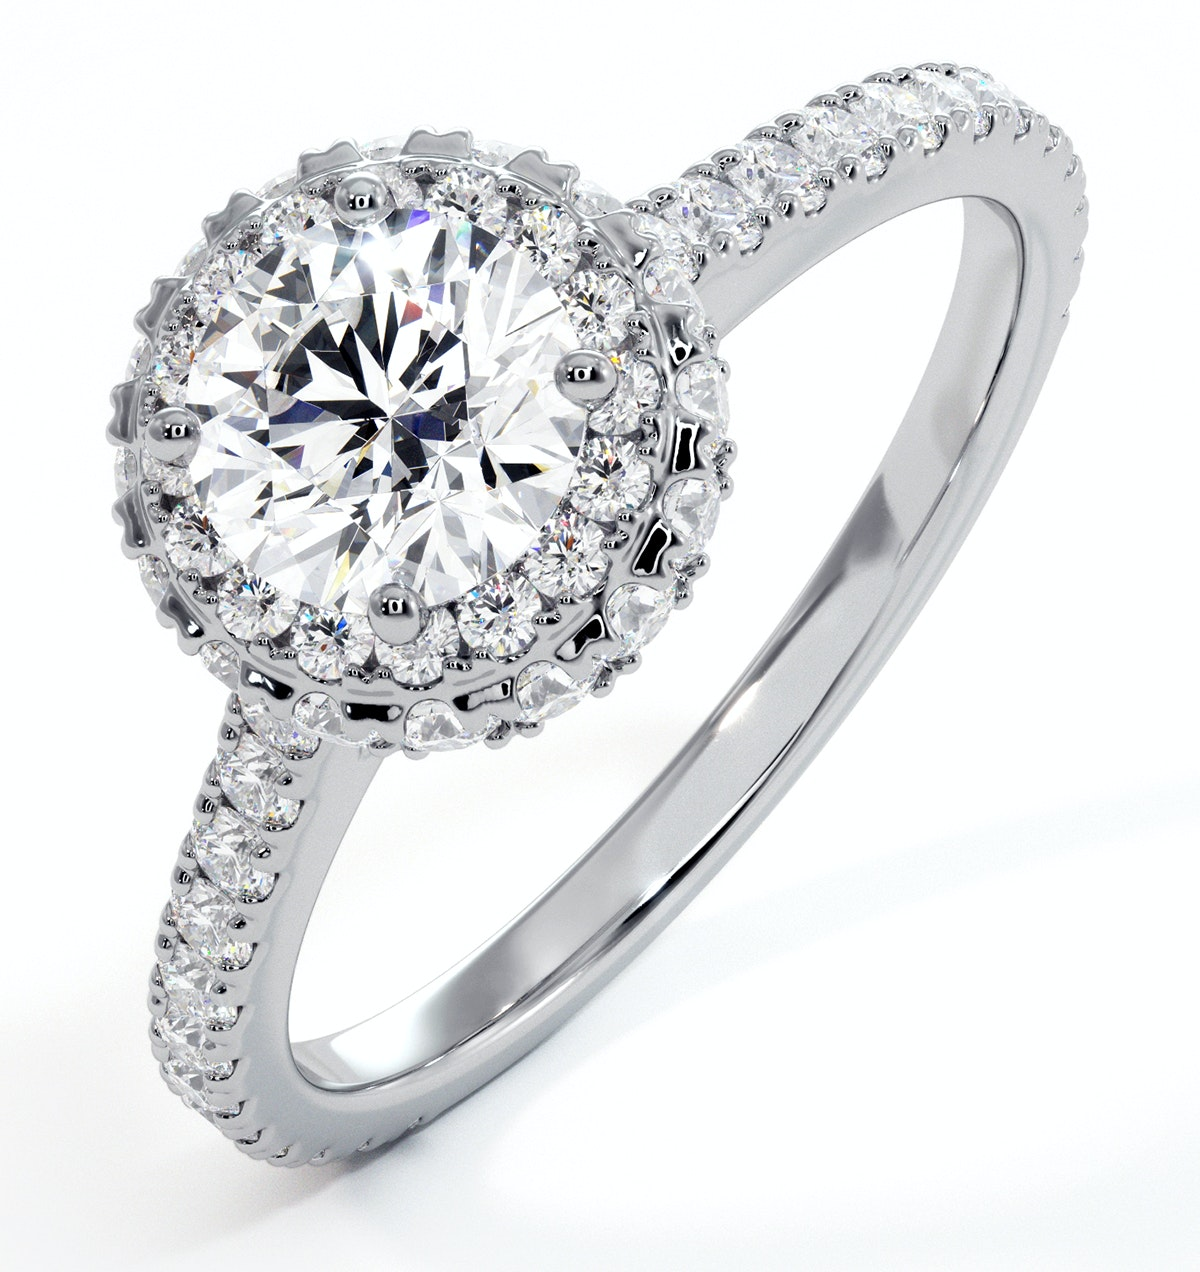 Valerie GIA Diamond Halo Engagement Ring in Platinum 1.40ct G/SI2